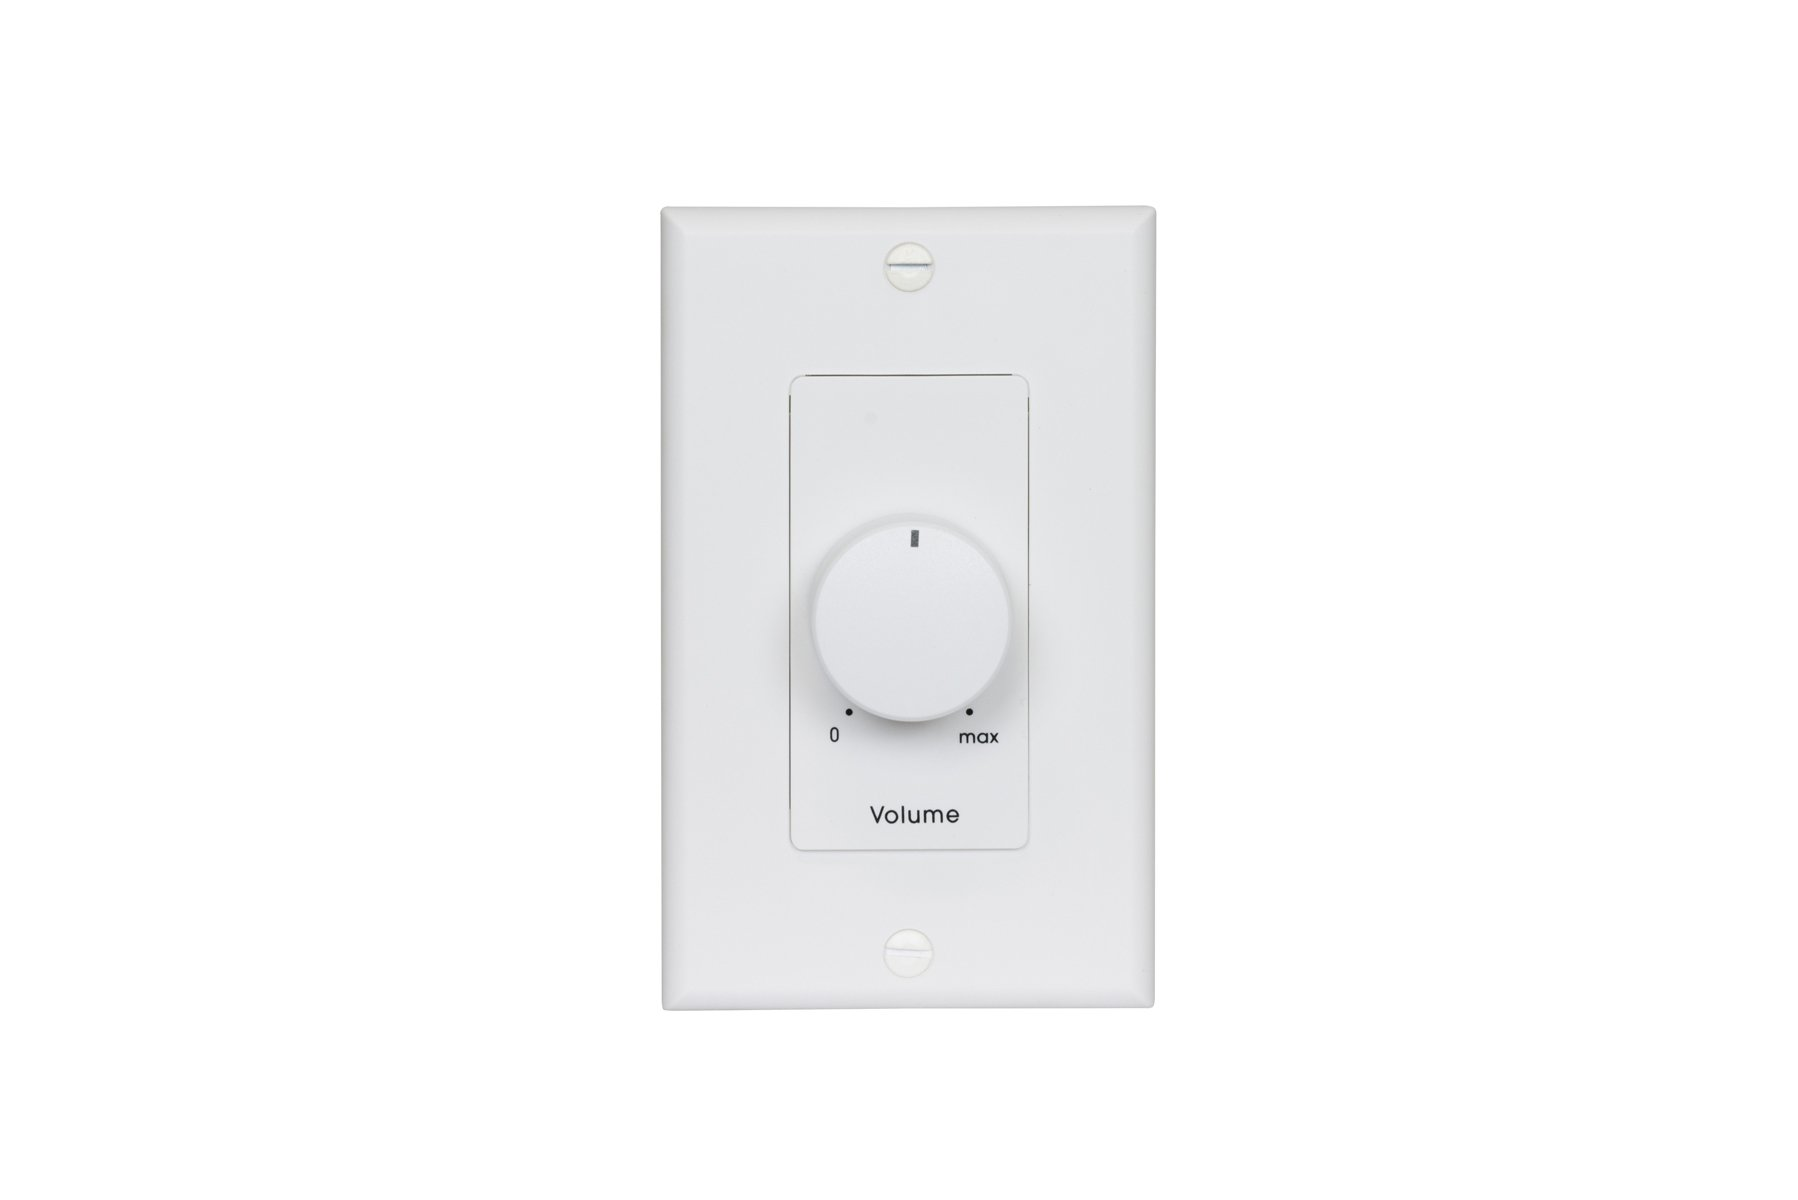 70 Volt Wall Plate Attenuator/Volume Control